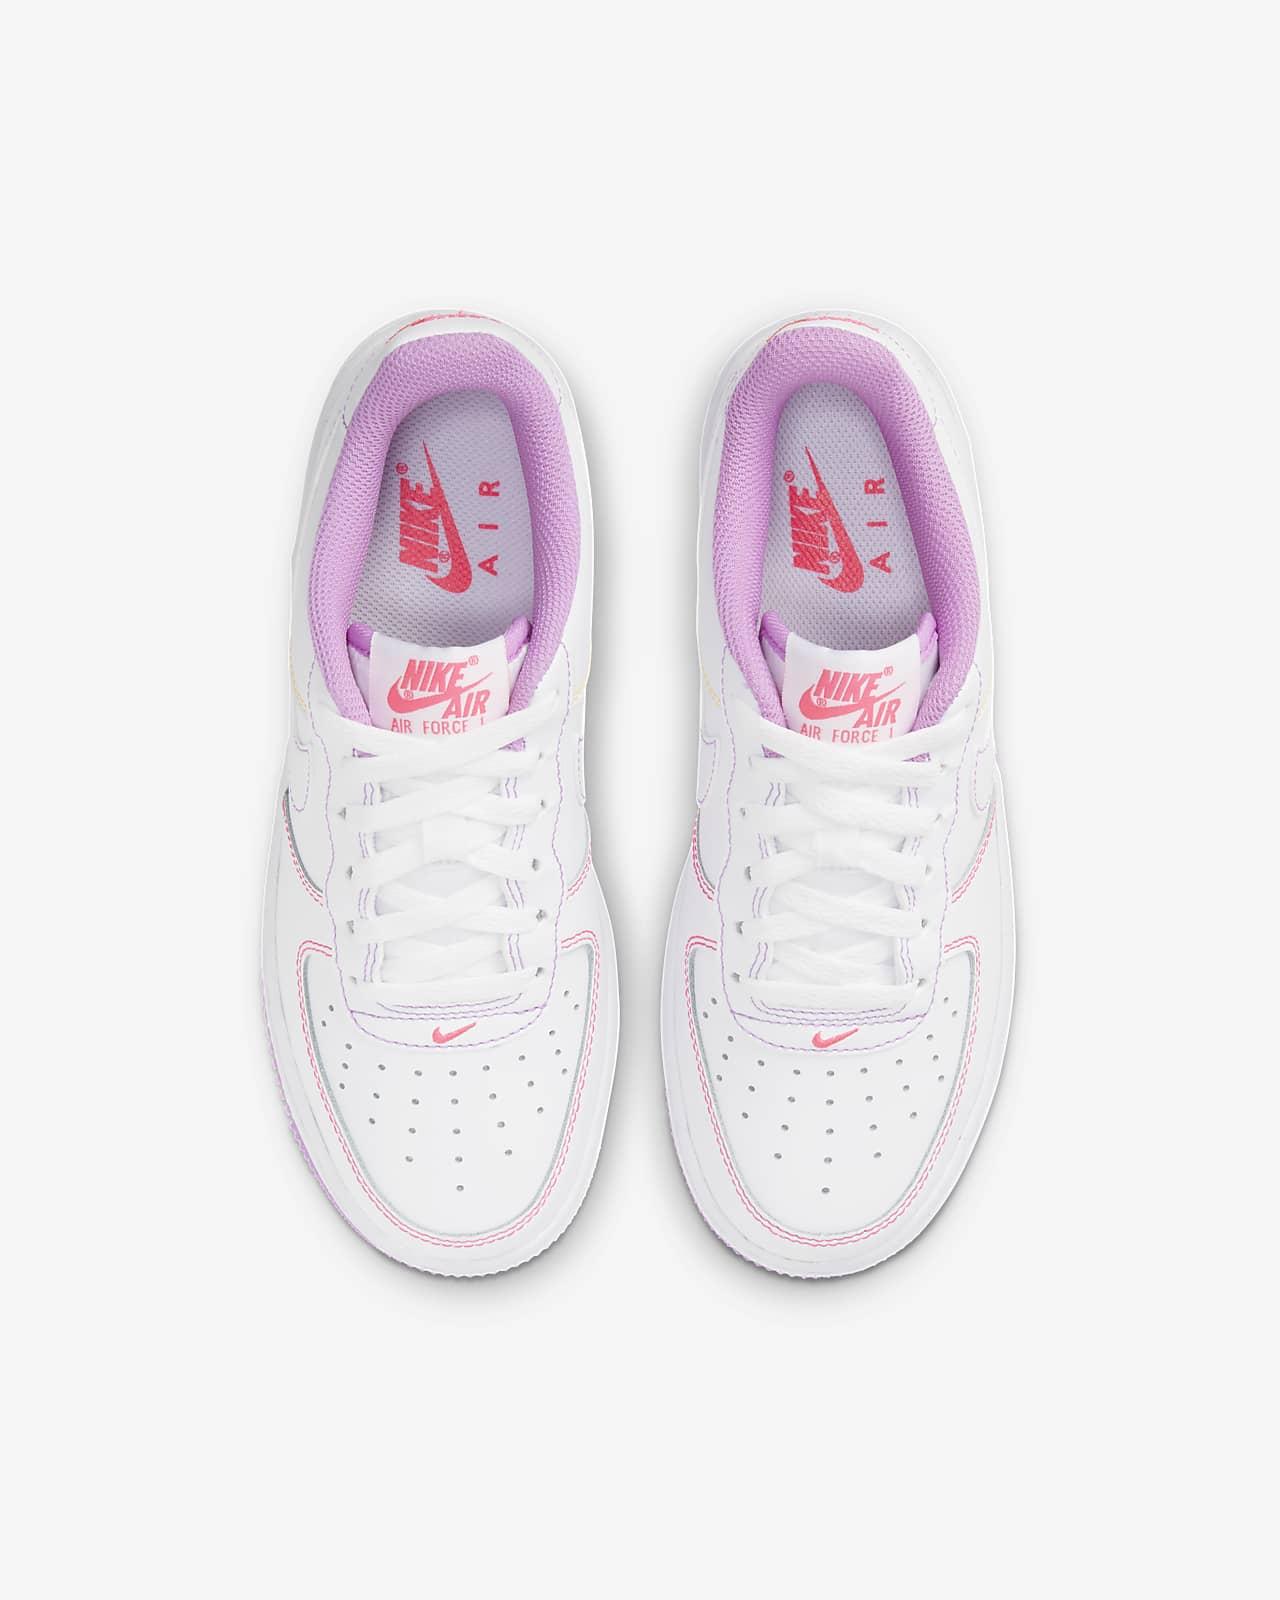 Nike Air Force 1 Older Kids' Shoe. Nike LU